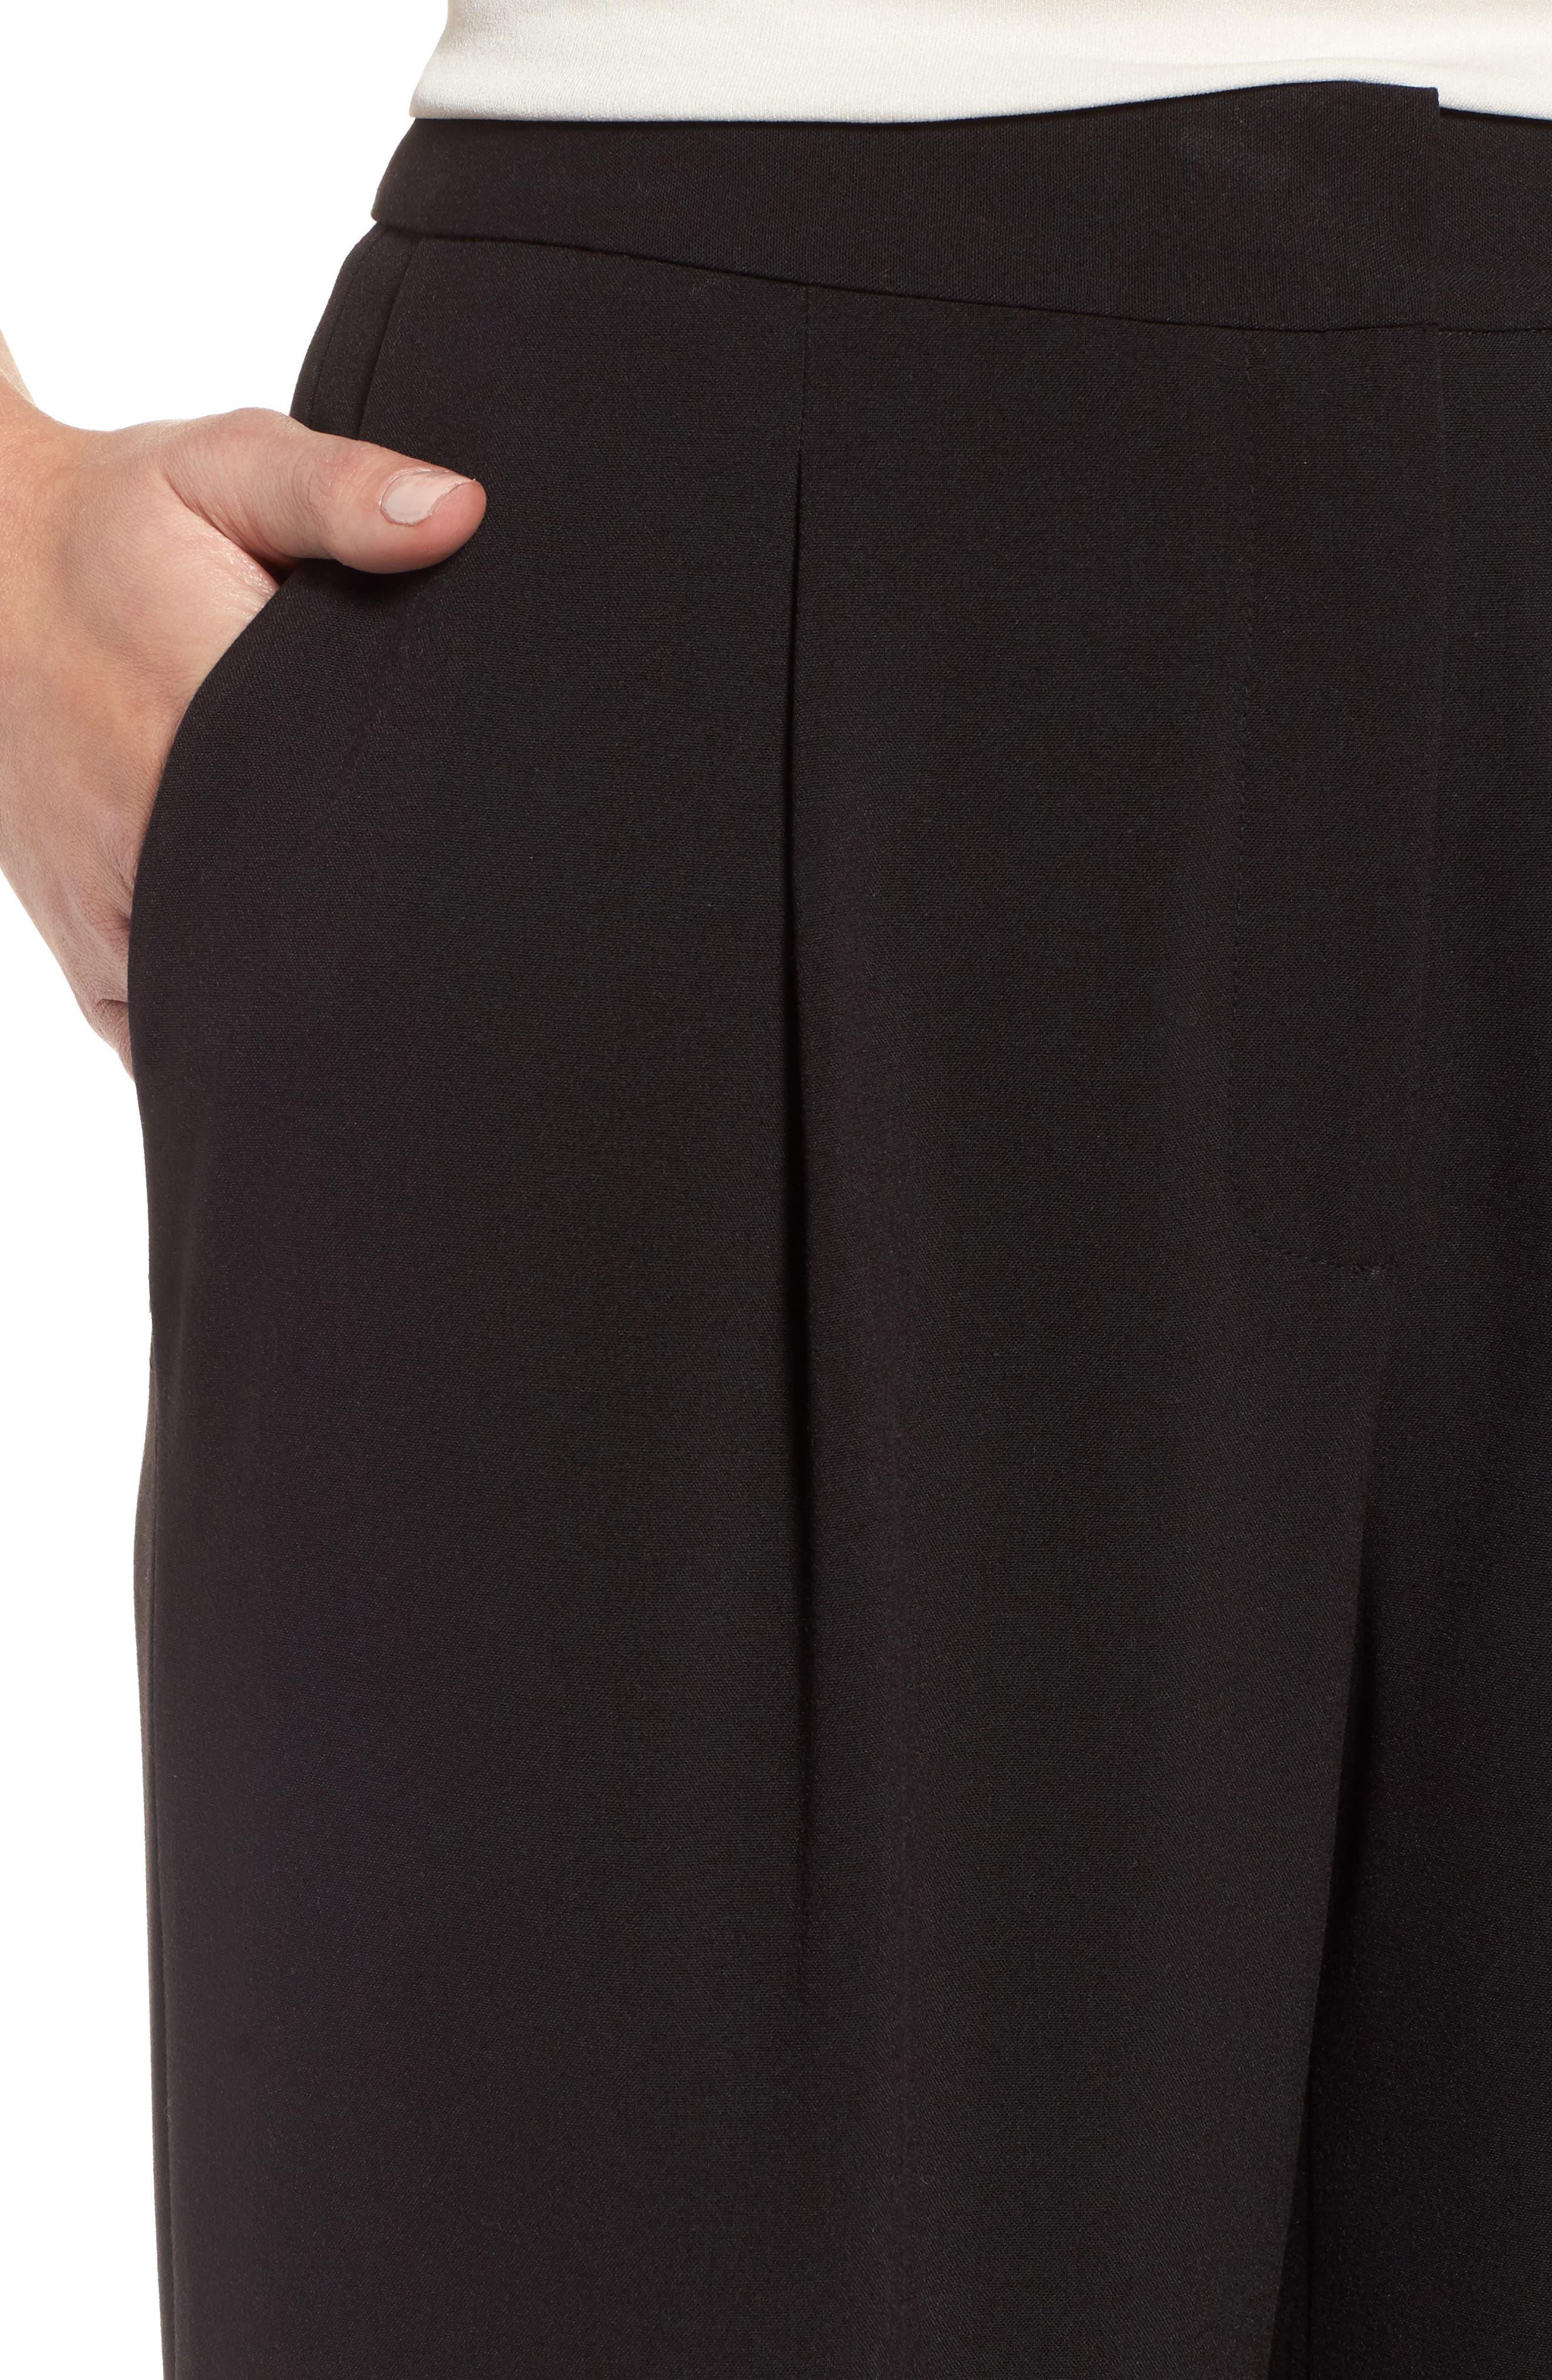 Notch Back Wide Leg Pants,                             Alternate thumbnail 4, color,                             Black